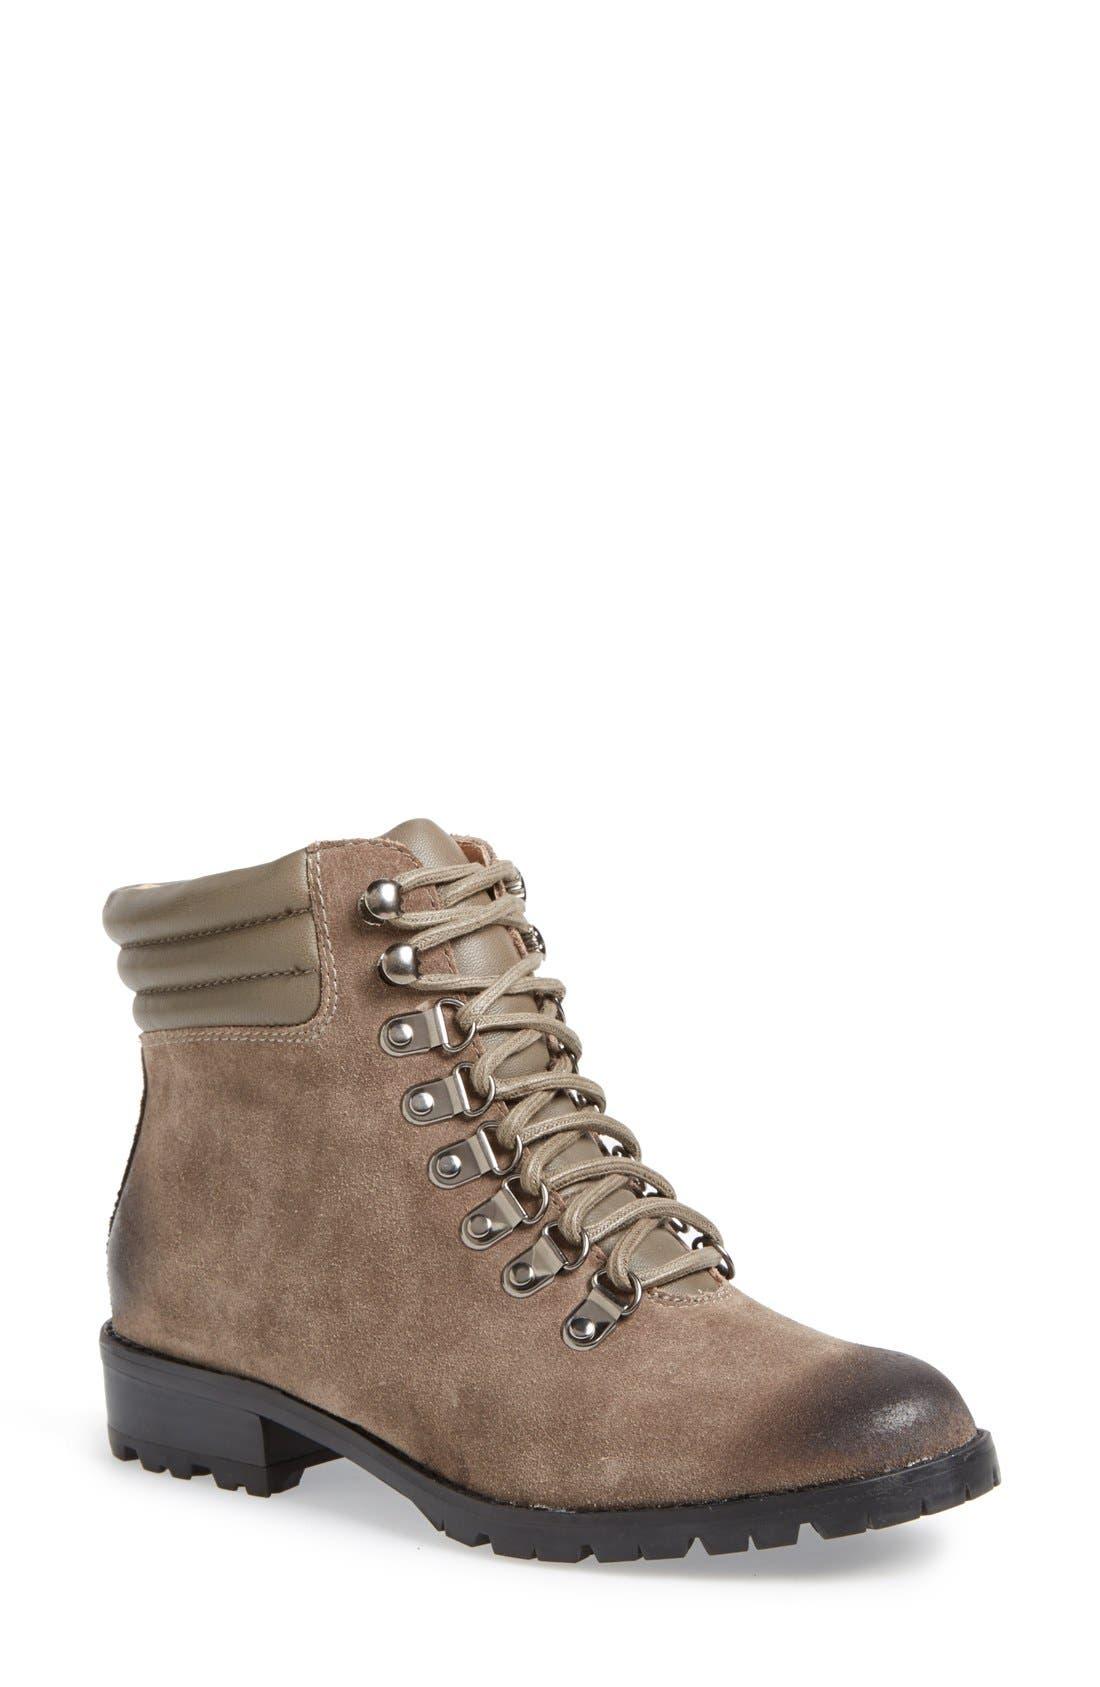 Main Image - Corso Como 'Whisper' Hiking Boot (Women)